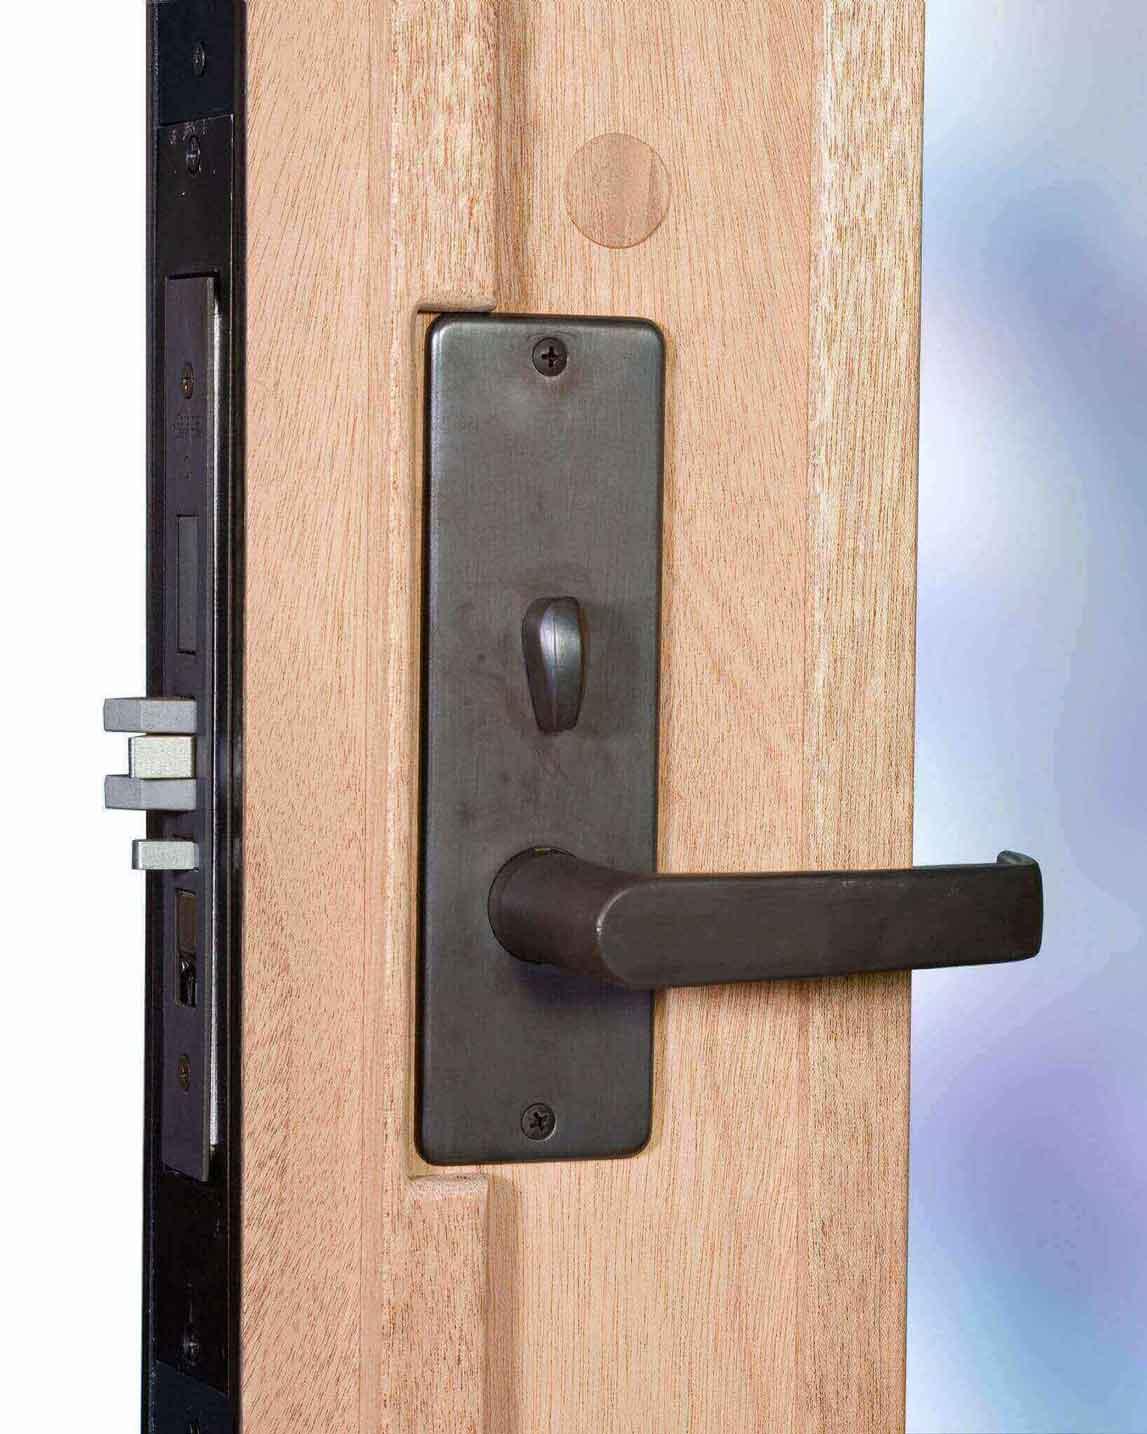 Wood Veneer & Maximum Security Doors - DOS 60 Minute FE/BR u0026 Fire - Ross Technology